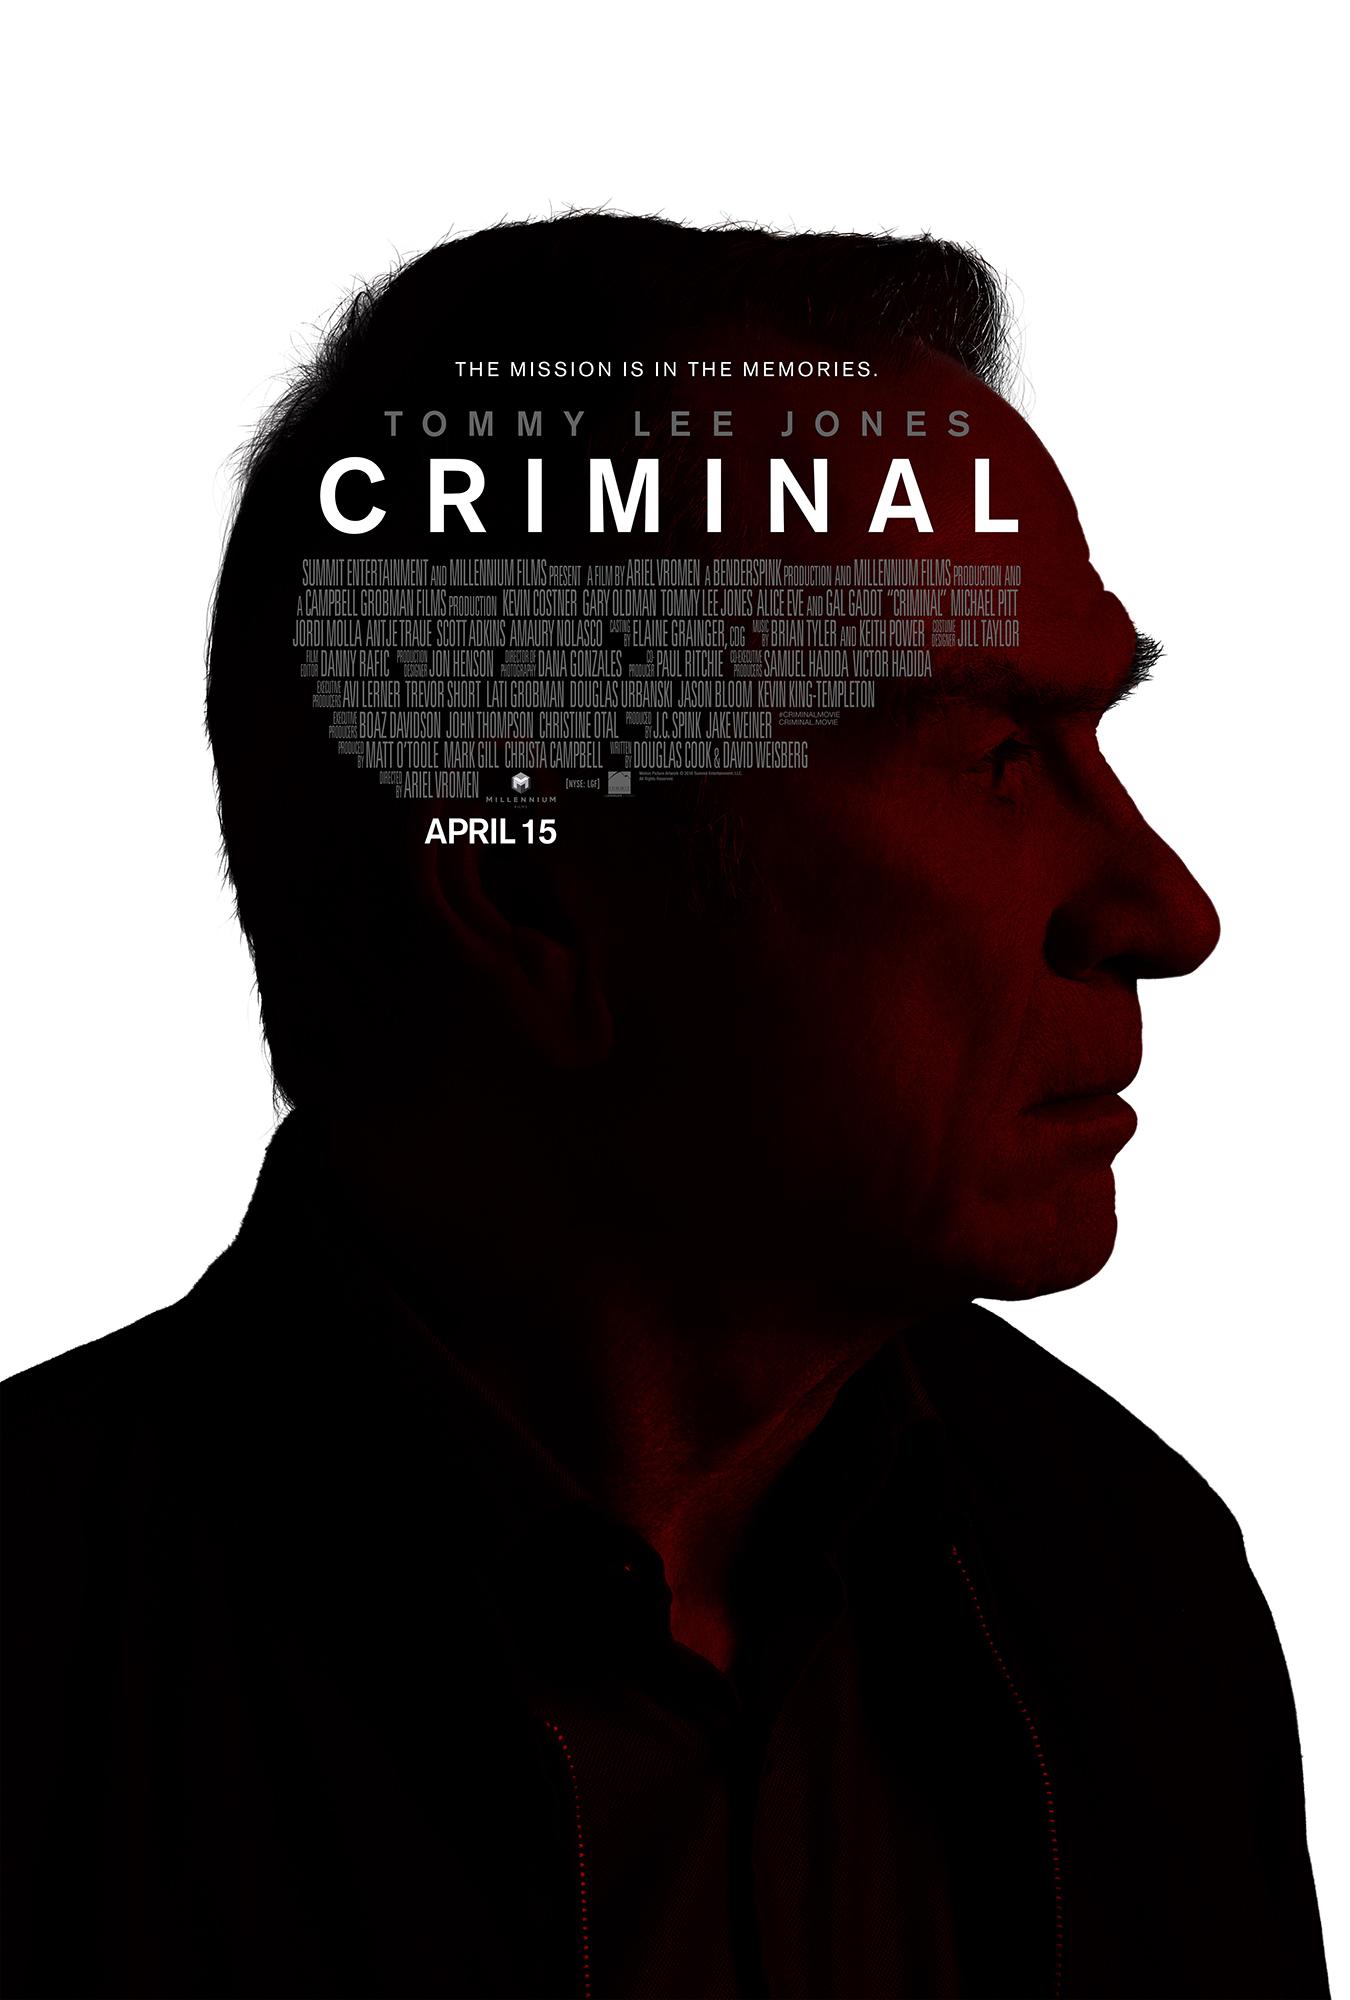 Criminal_Tsr_TLJ_Trim_100dpi.jpg